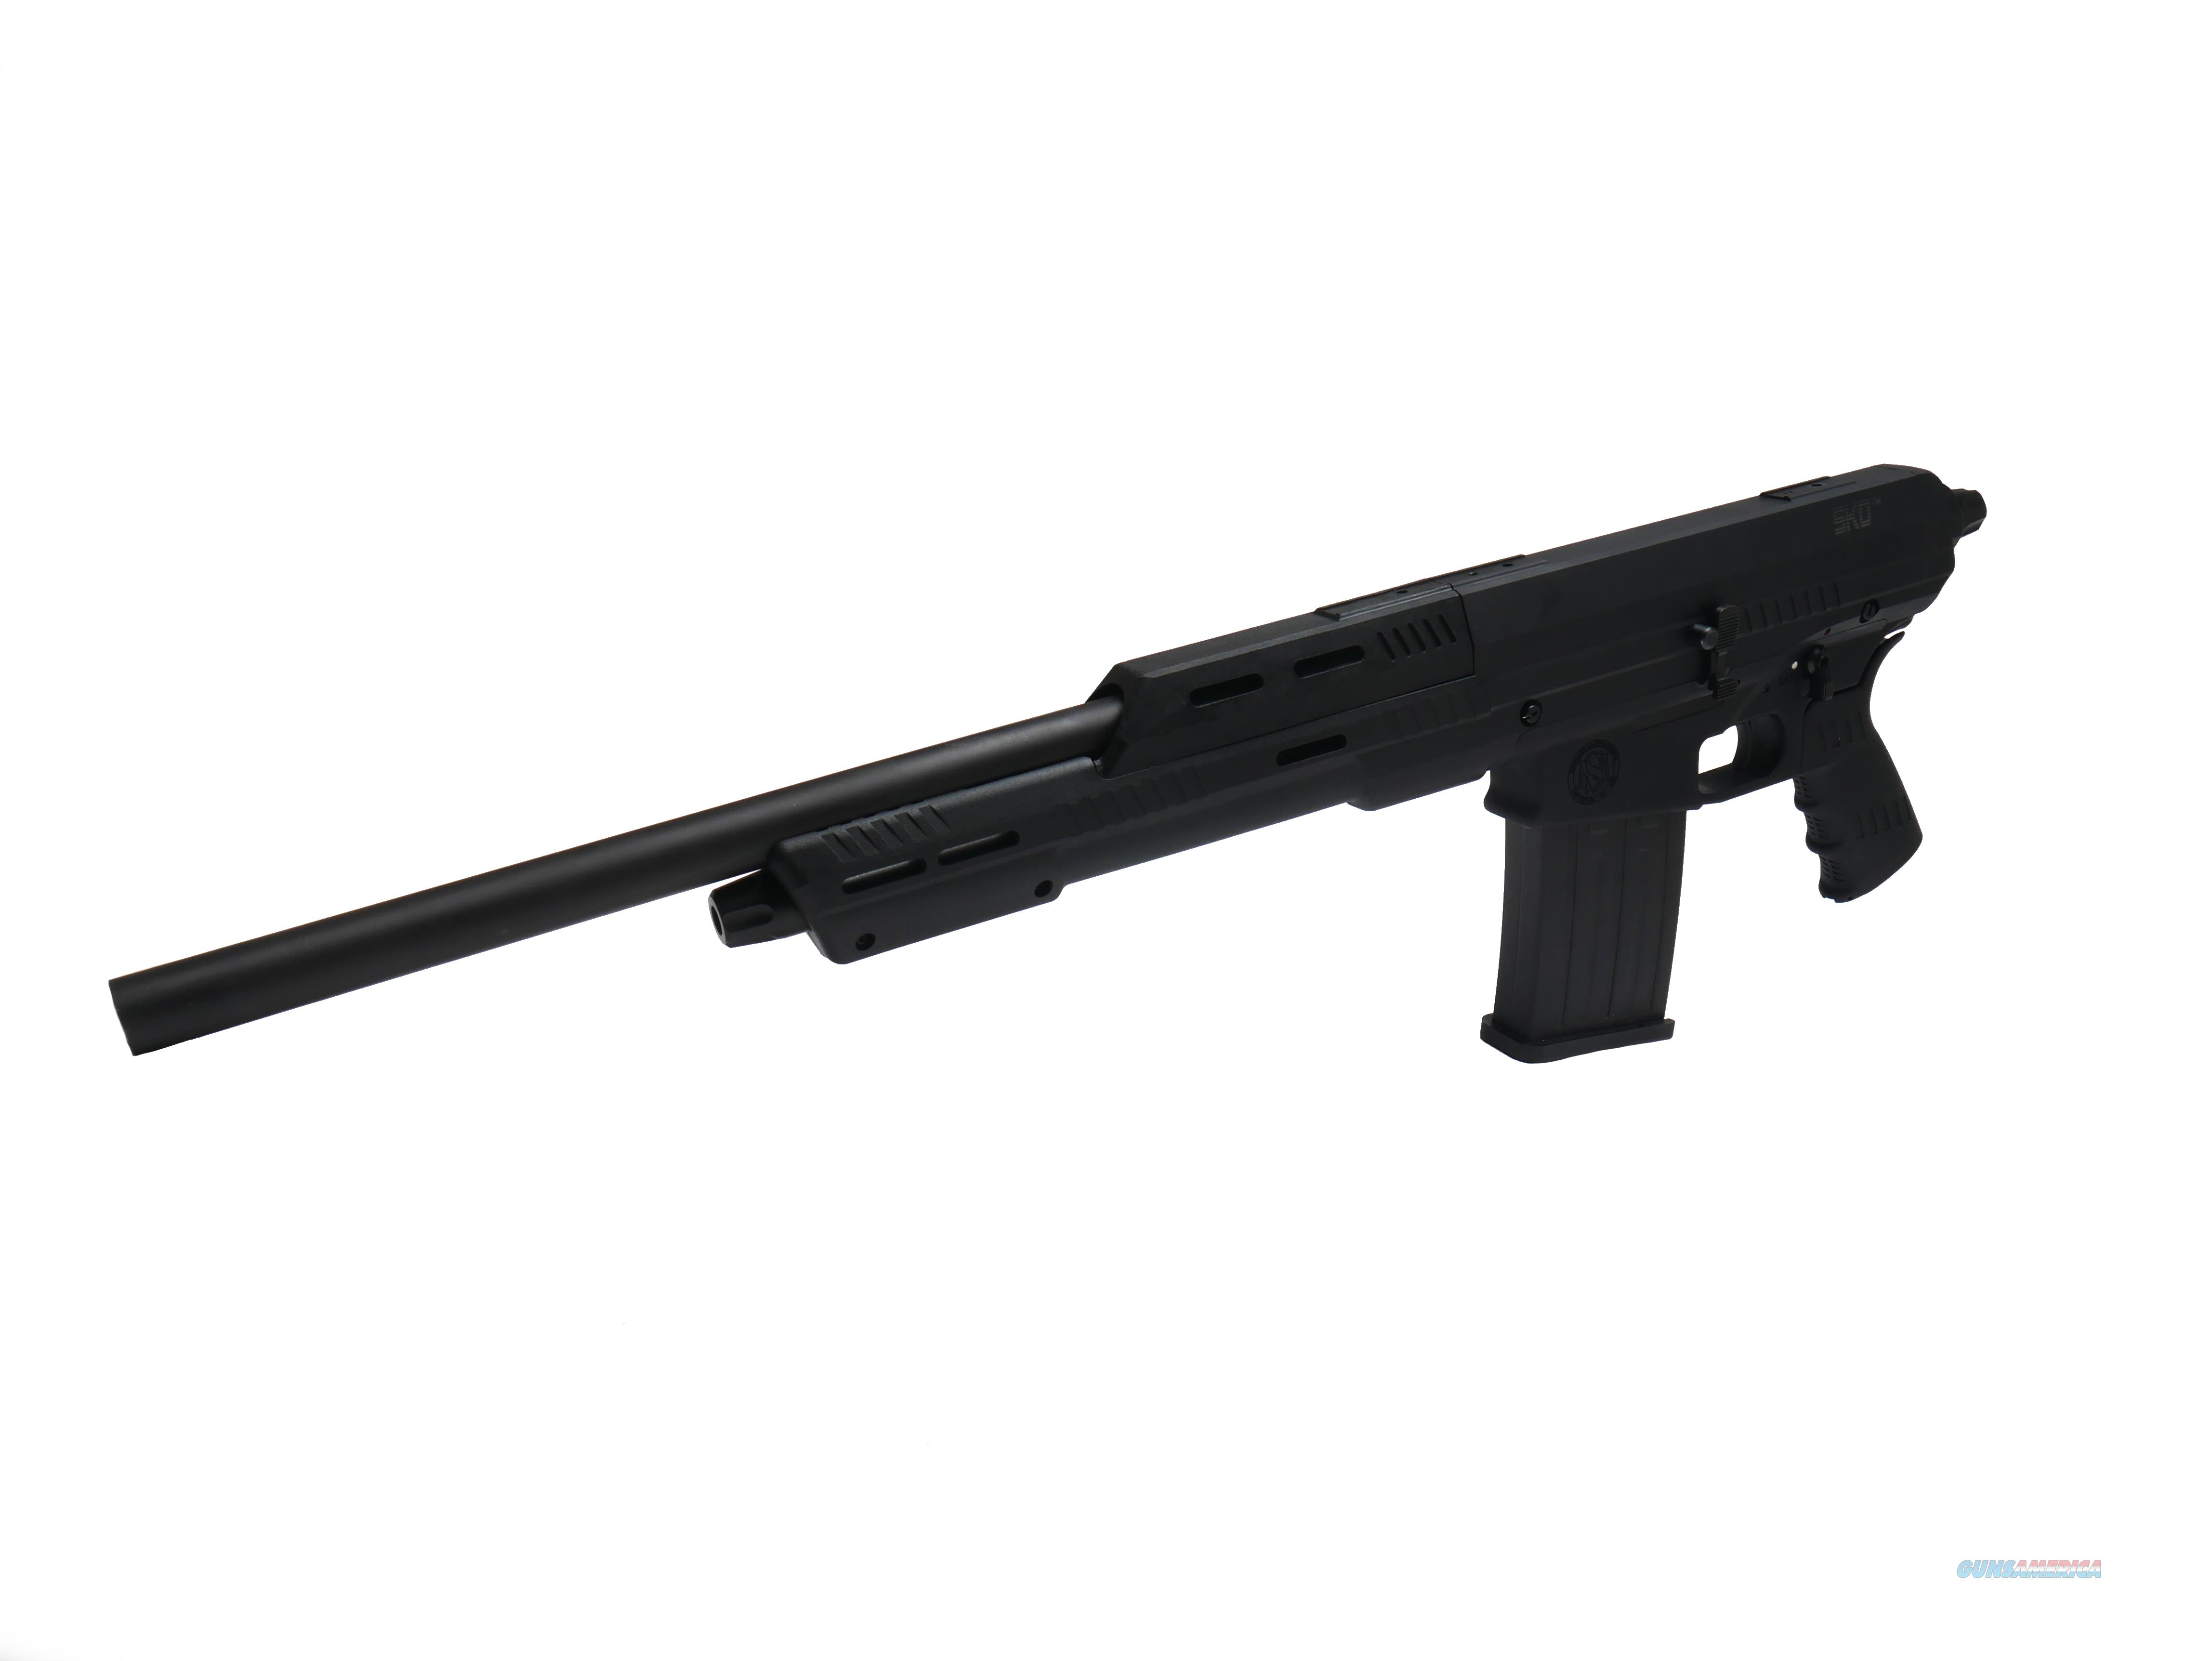 3dc1a27643a4 Standard Manufacturing SKO Shorty Guns   Shotguns   S Misc Shotguns.  11727798.jpg.  UserImages 175579 930635042 11727798.jpg. 11727799.jpg